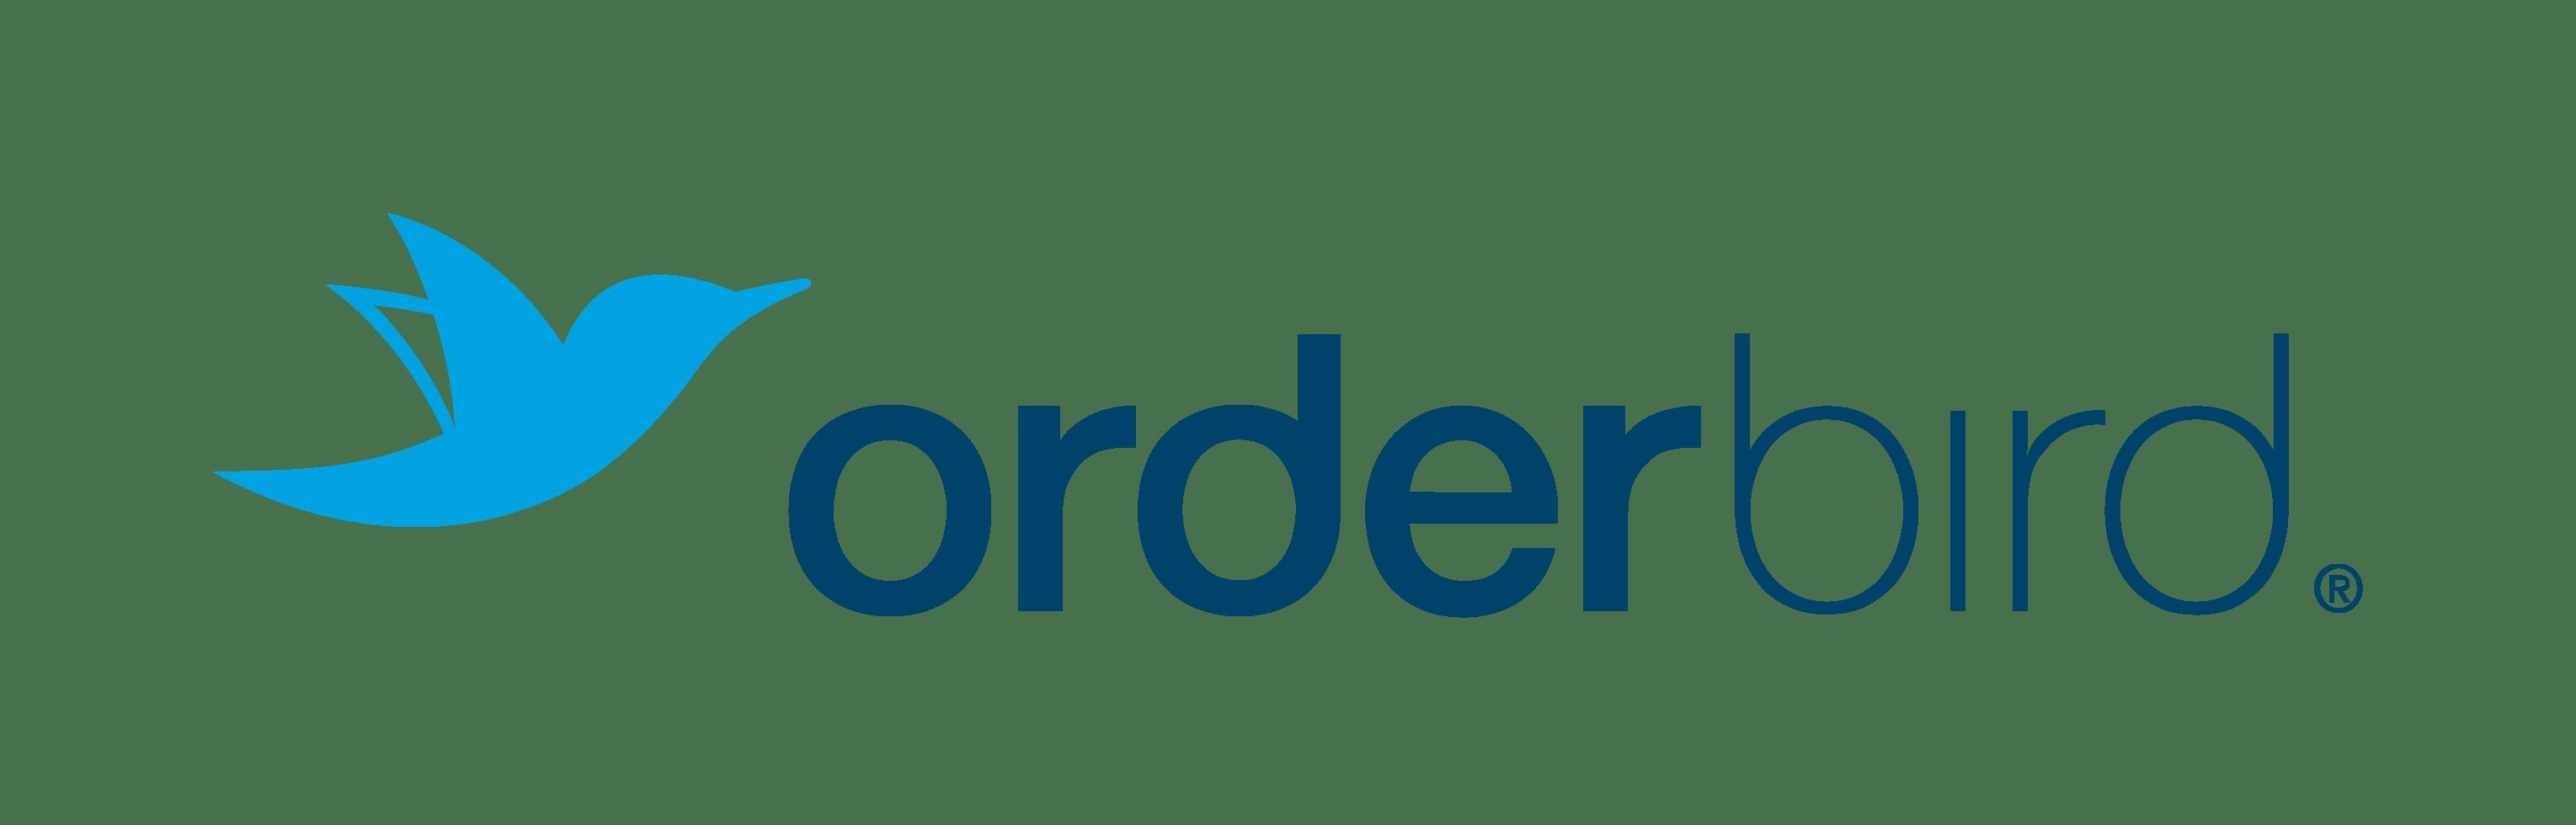 orderbird company logo